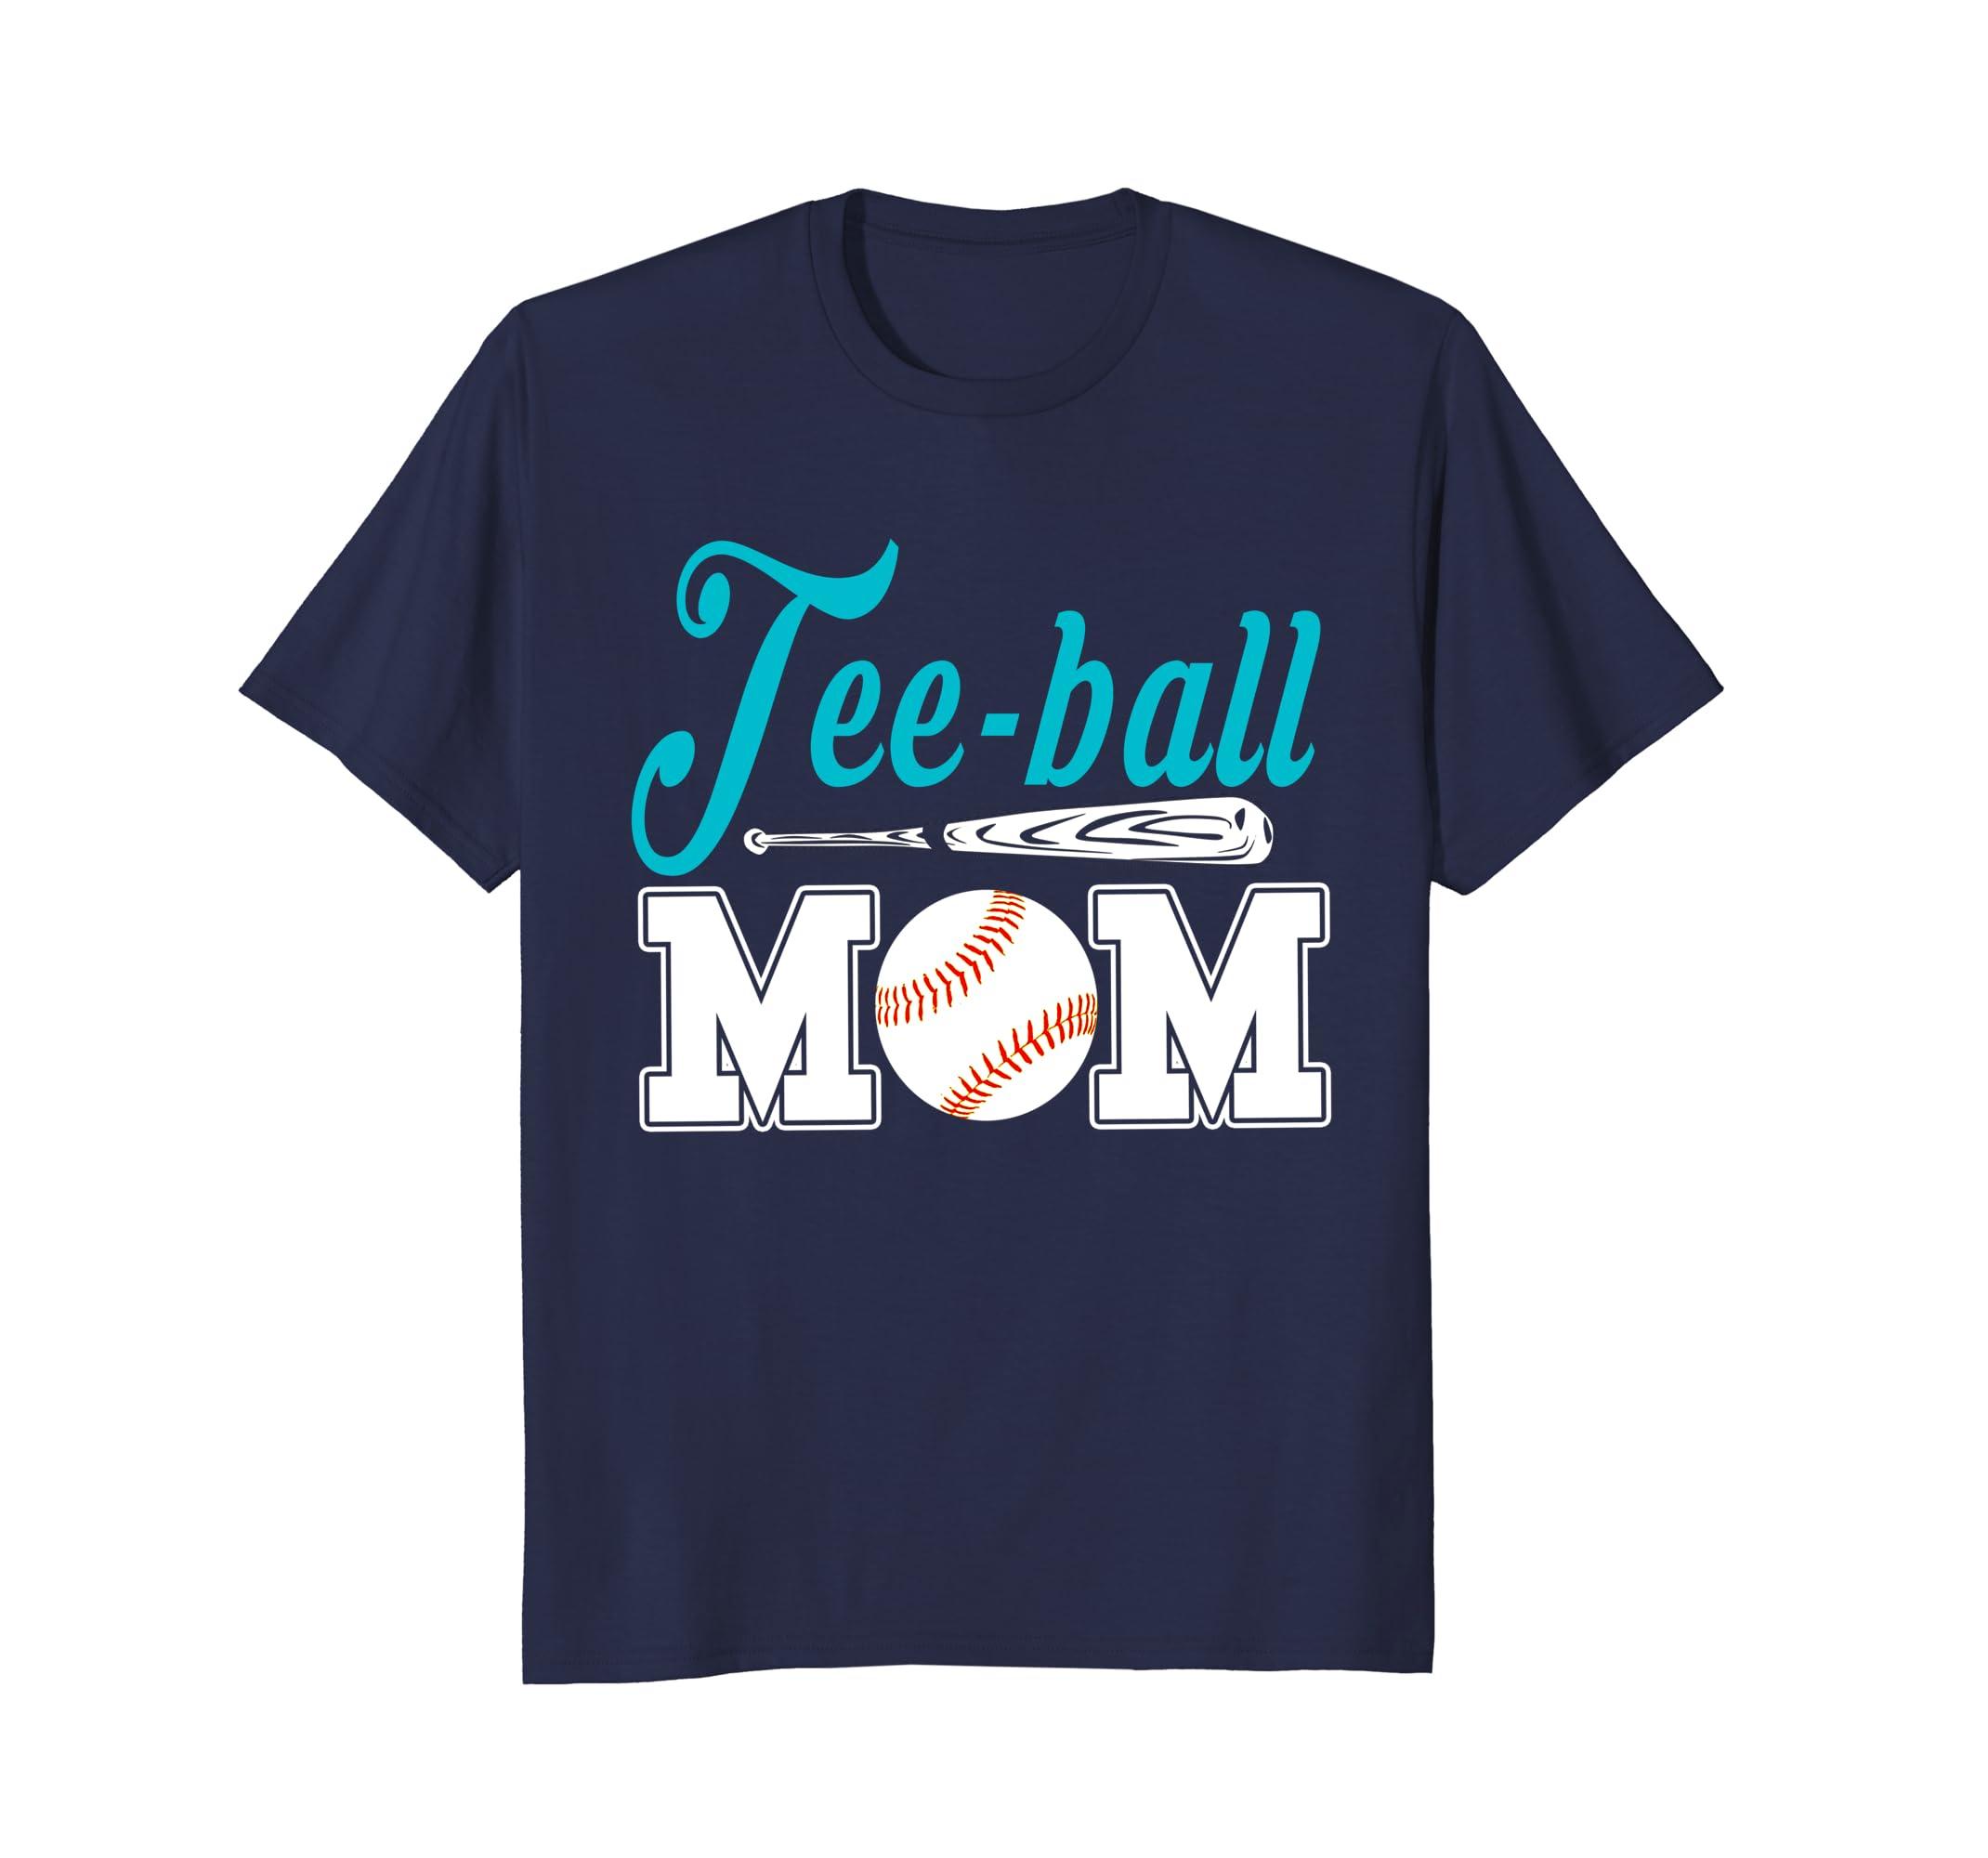 Tee ball mom softball mom t shirt-ah my shirt one gift